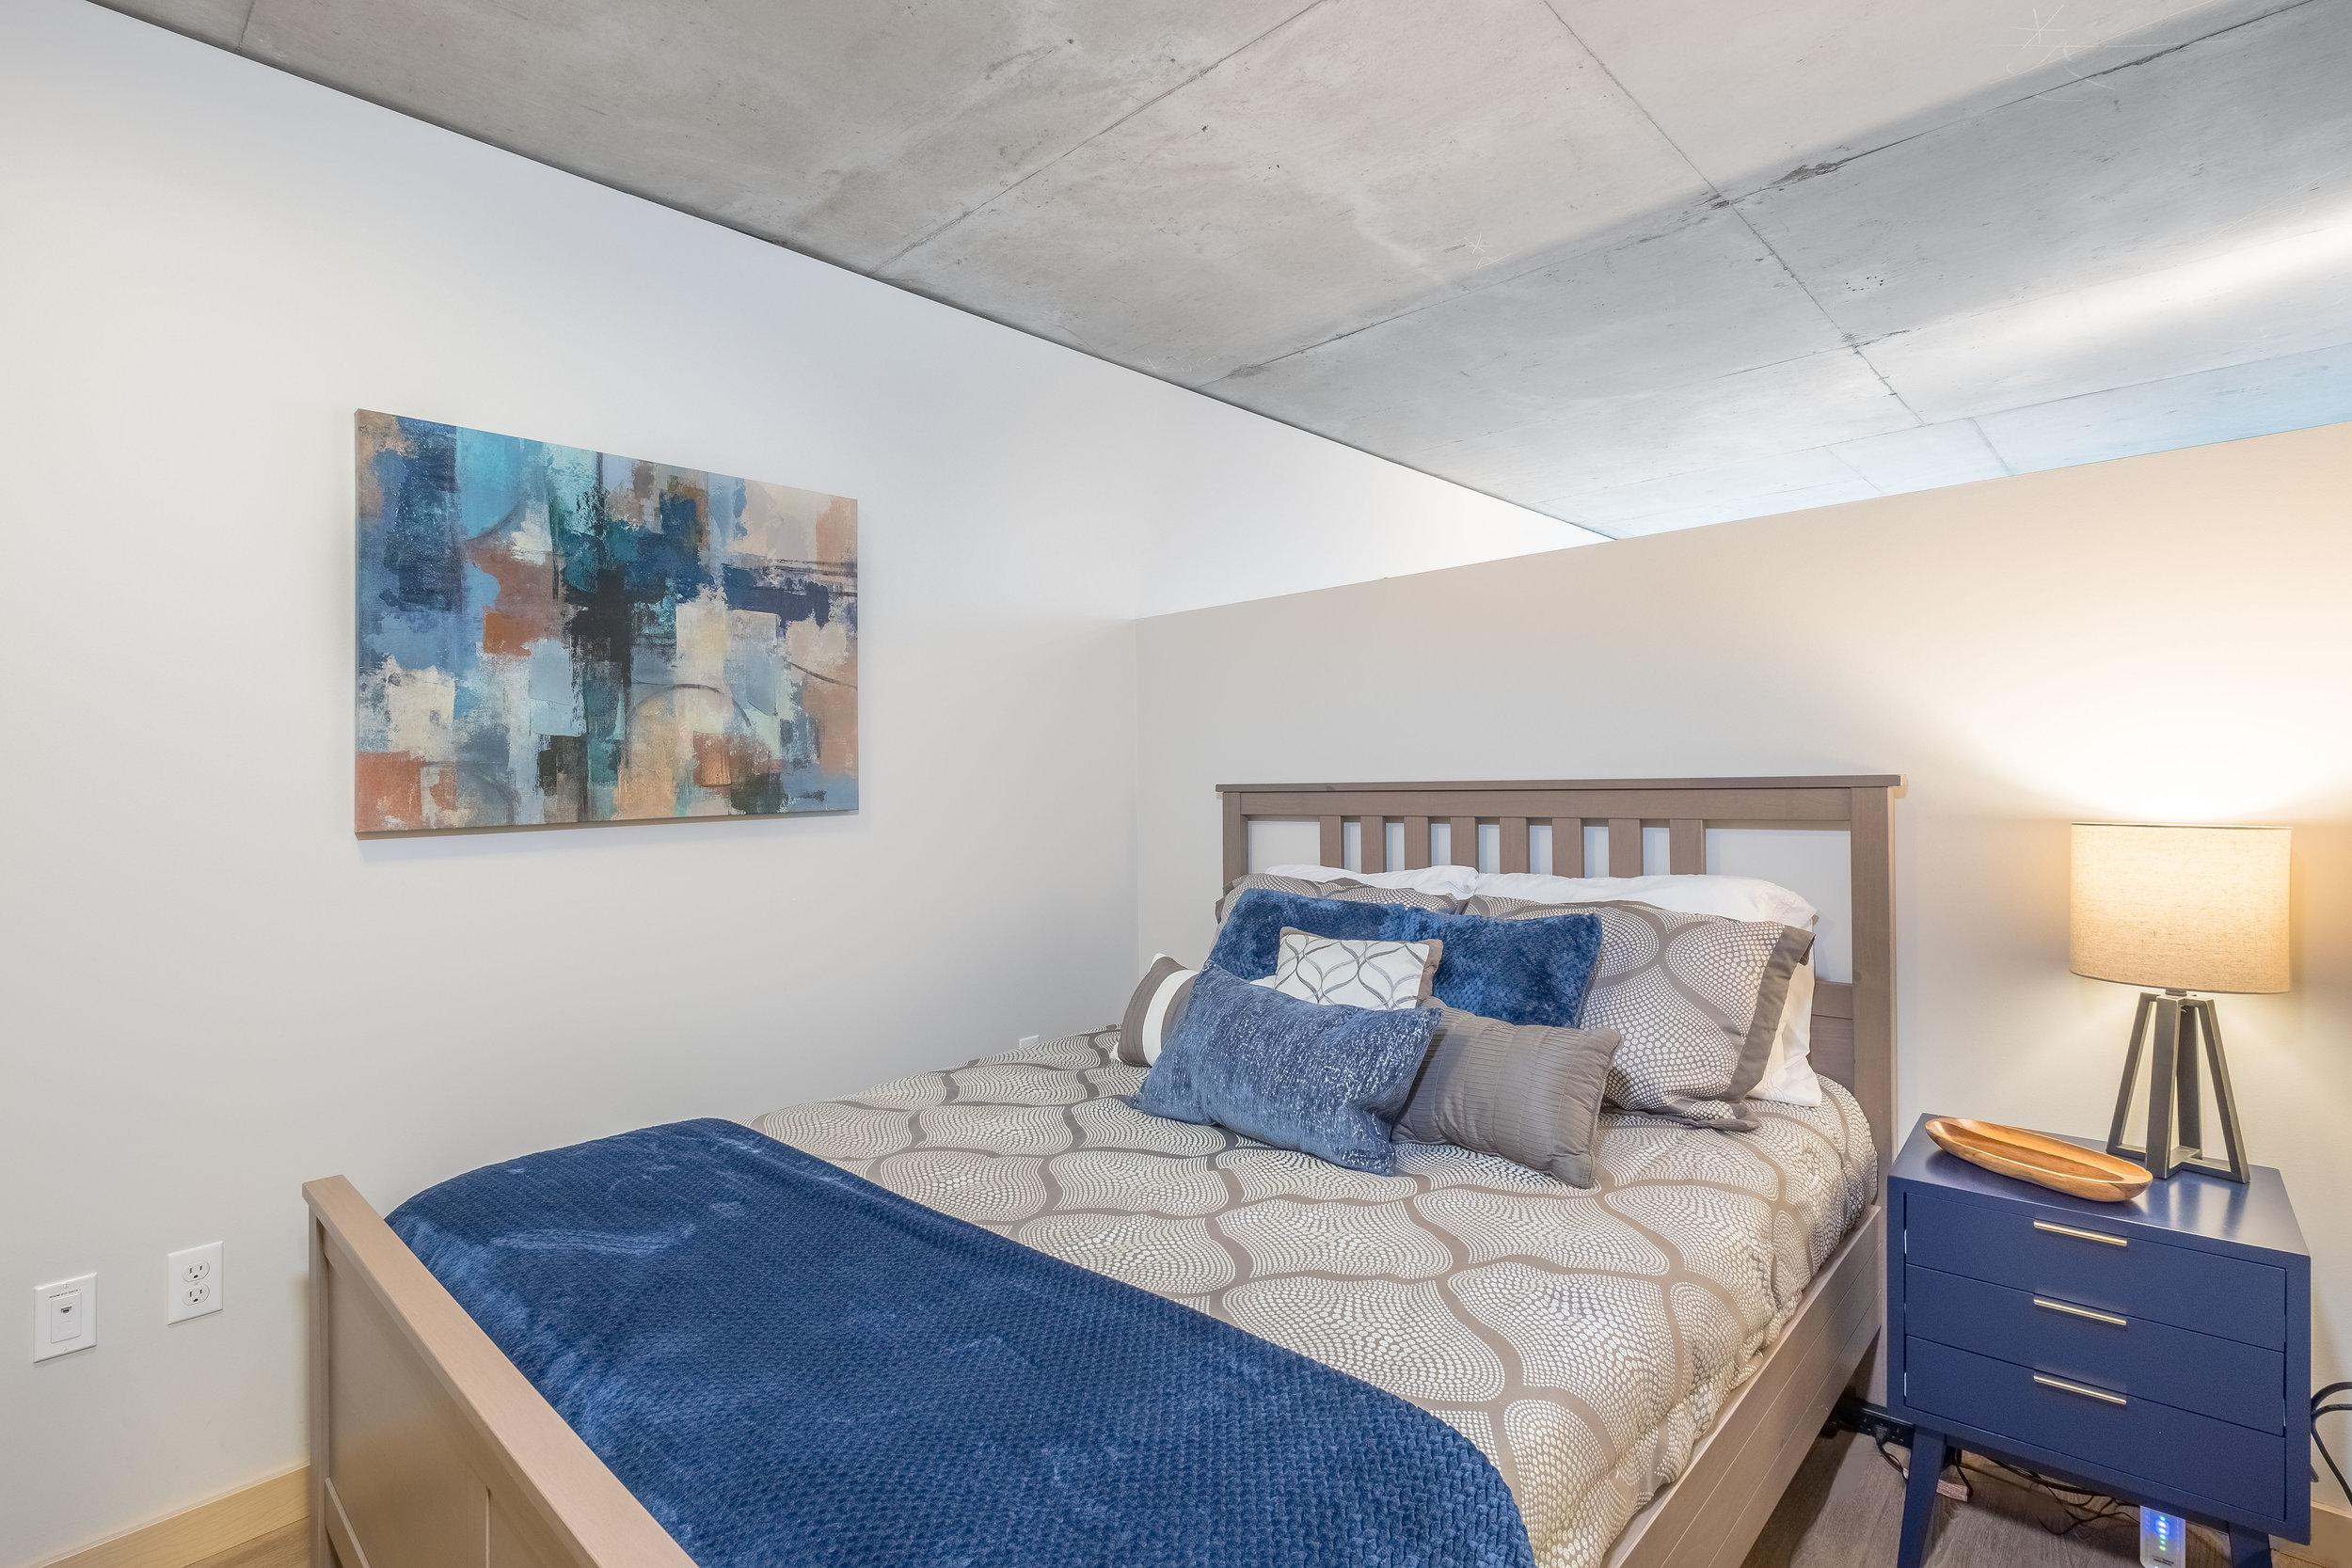 Short-Term/ Vacation Rental: Modern Contemporary Bedroom Furnishing